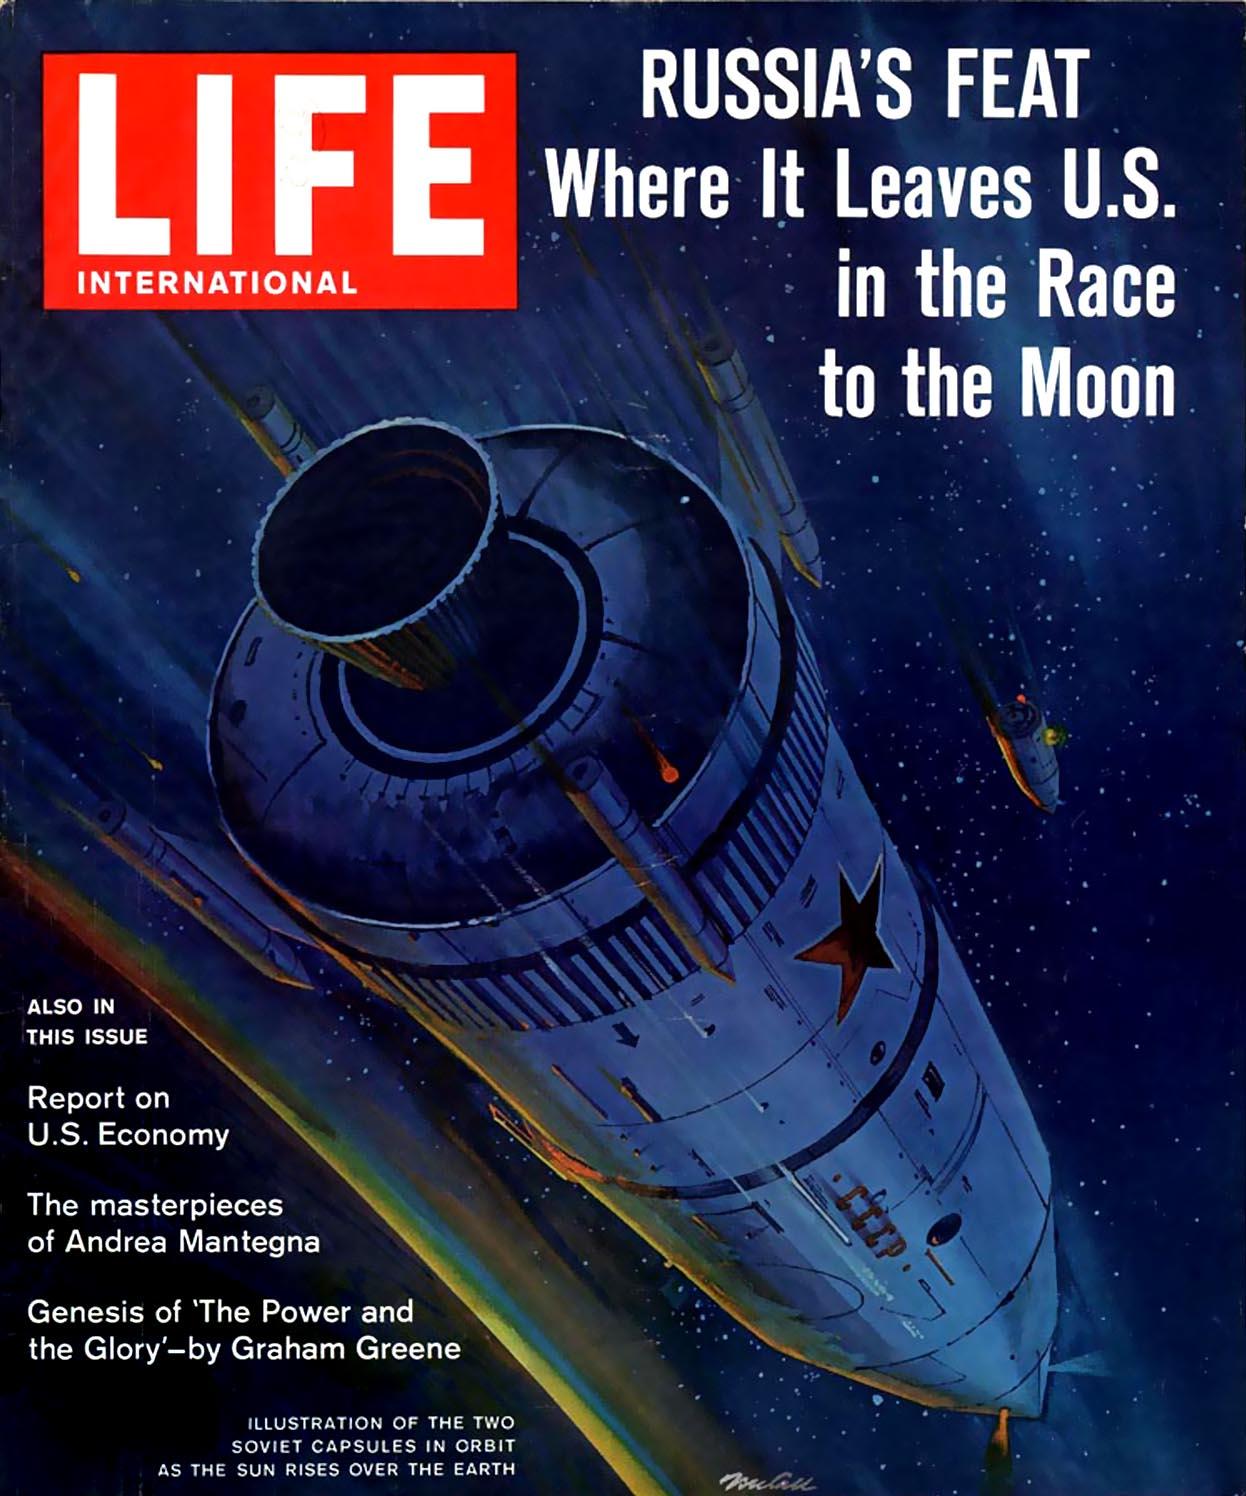 ATOMIC-ANNIHILATION: 1962 ... Space Race